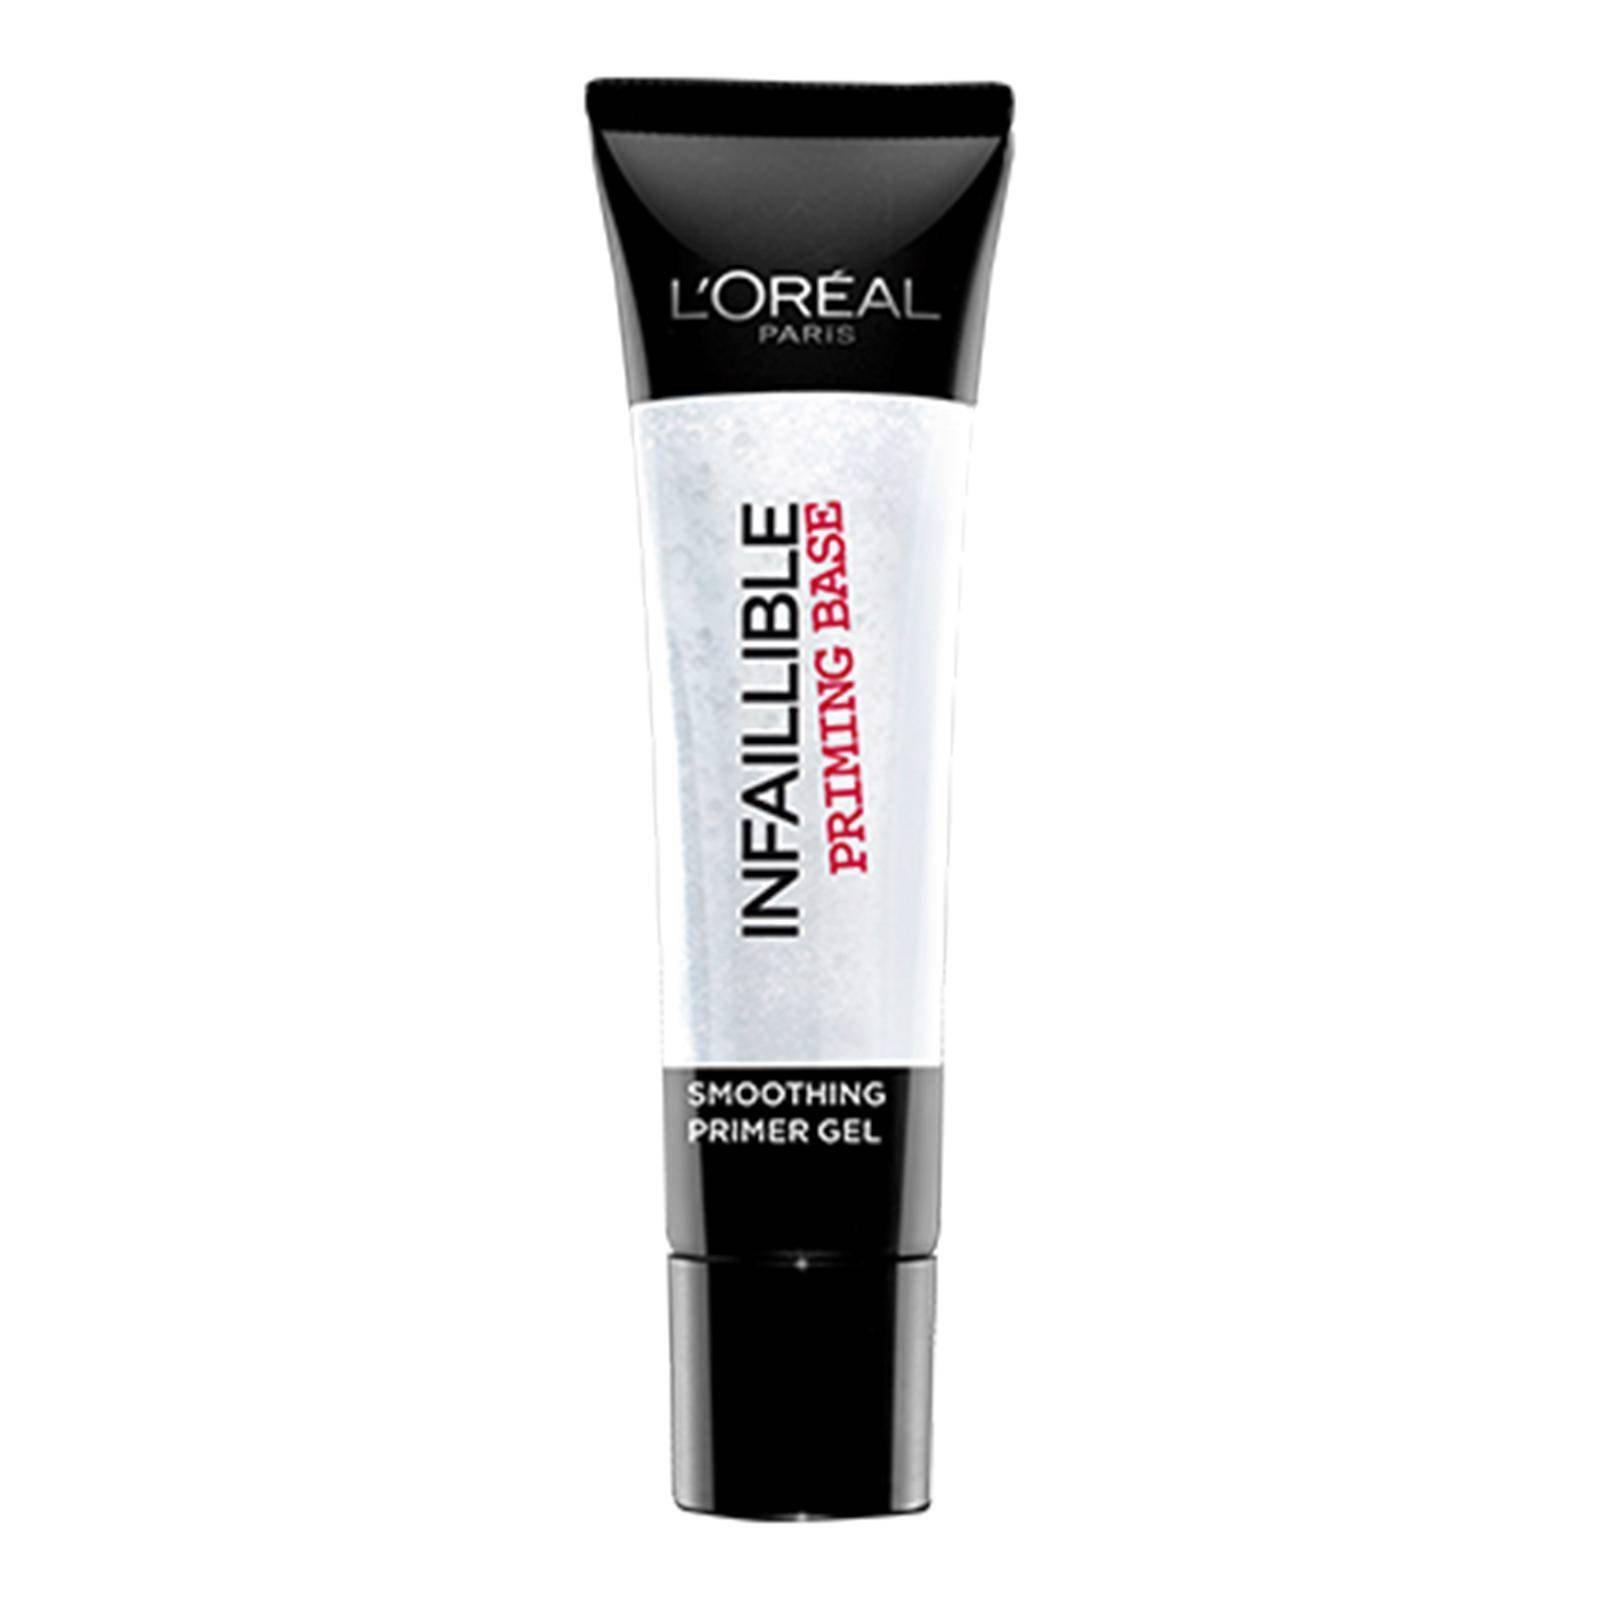 L'Oréal Paris Infallible Firming Base soothing primer